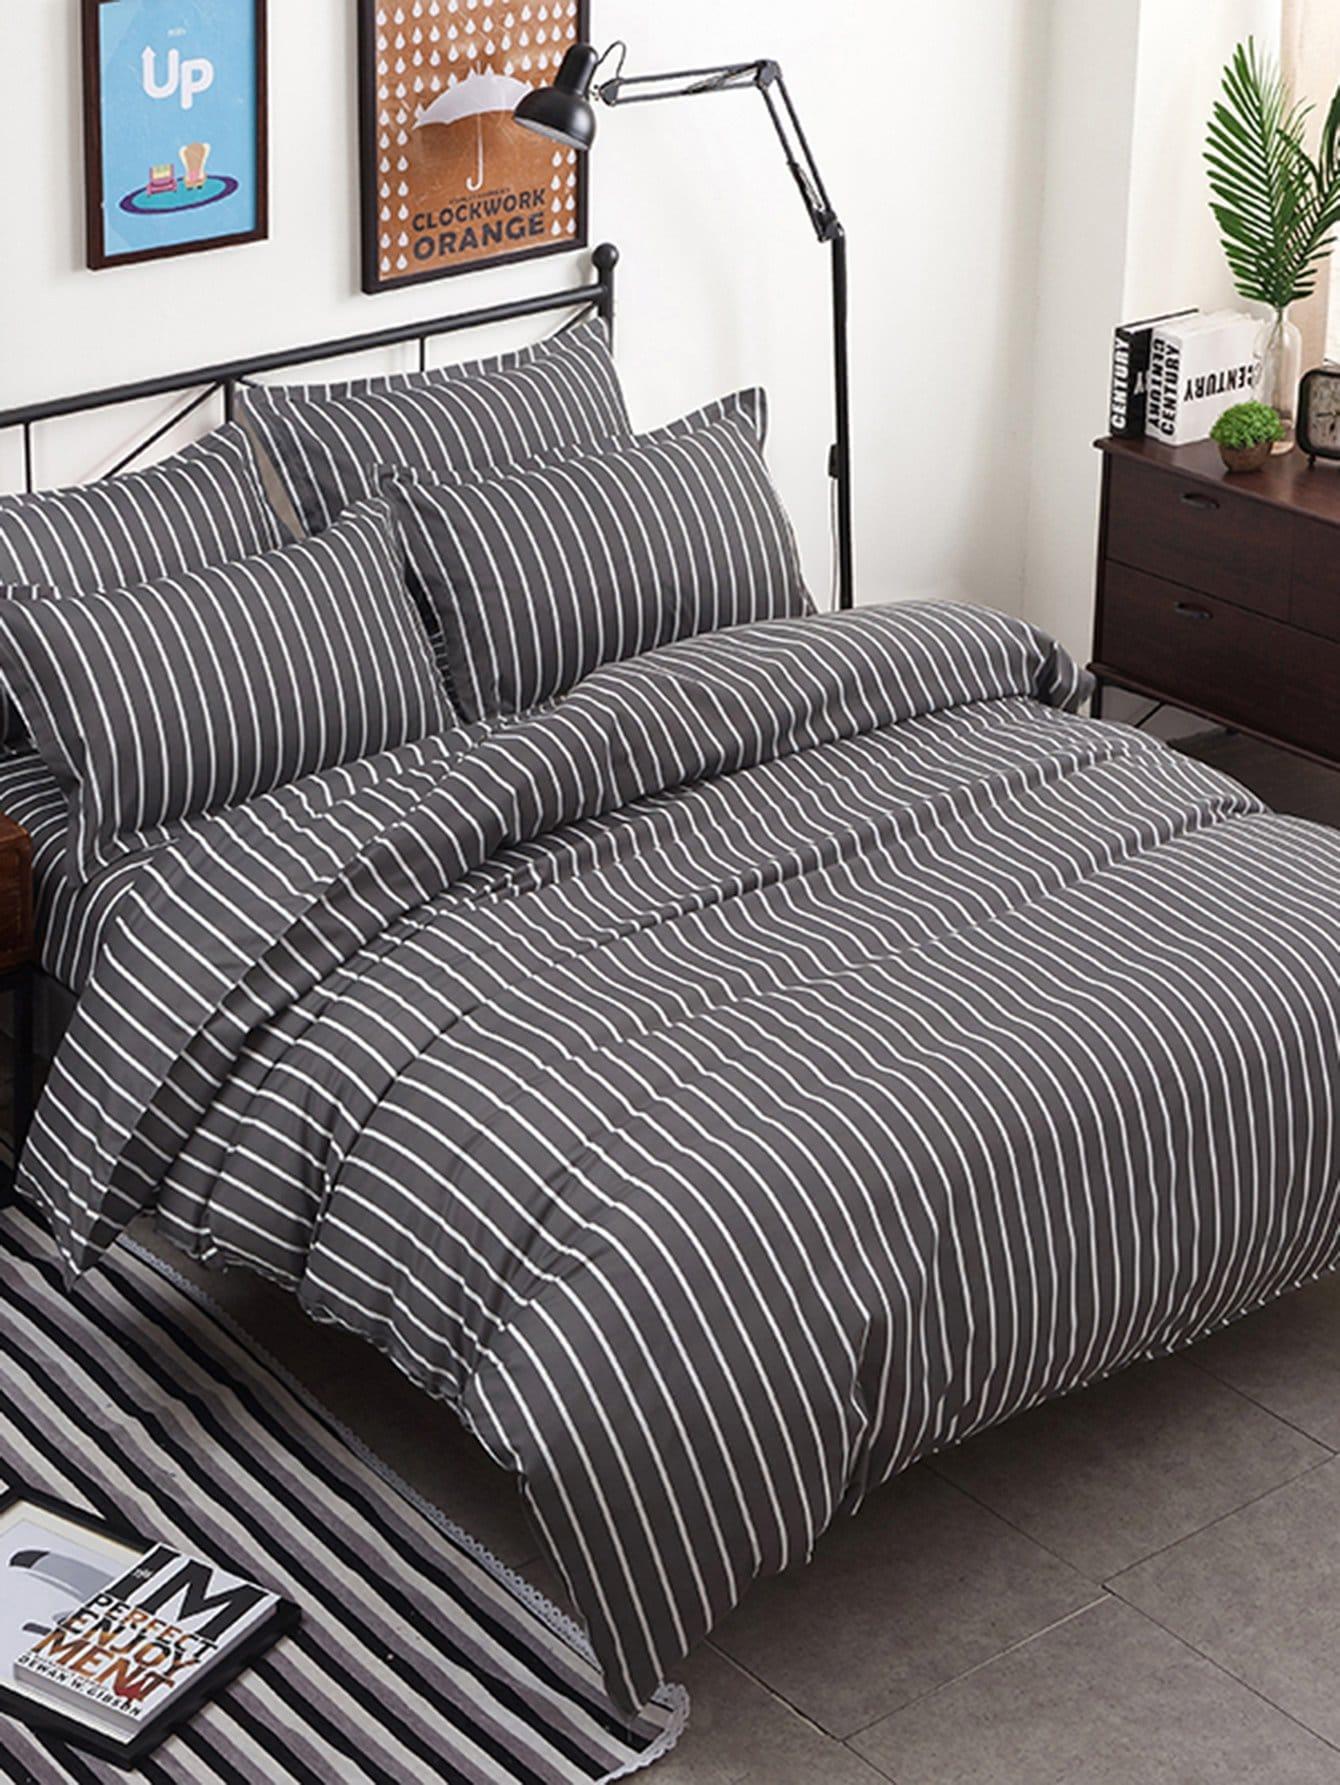 Striped Minimalist Duvet Cover Set striped minimalist duvet cover set